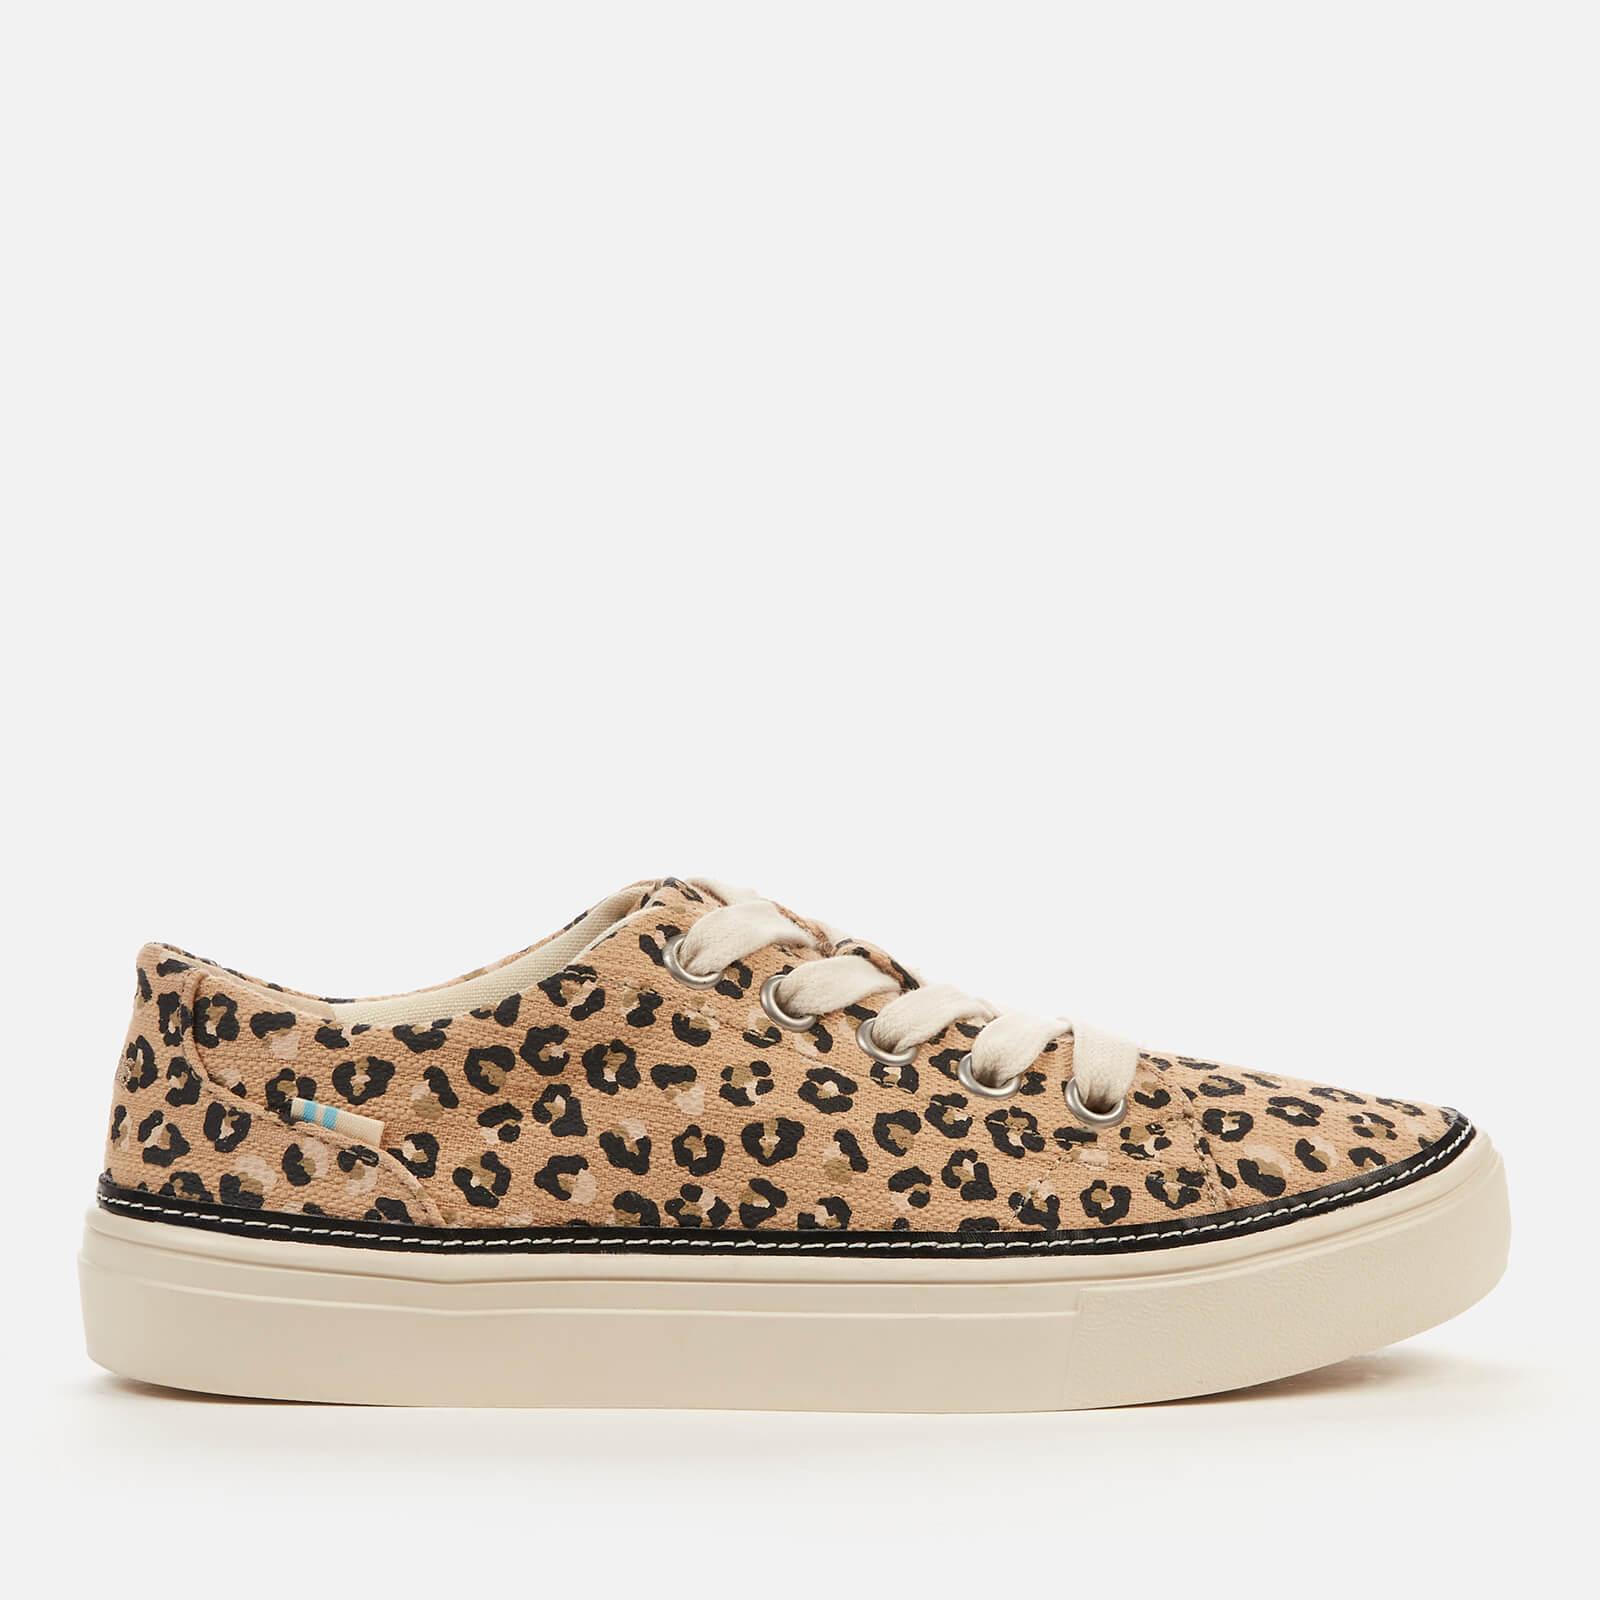 TOMS Women's Alex Vegan Low Top Trainers - Natural Textured Cheetah - UK 3